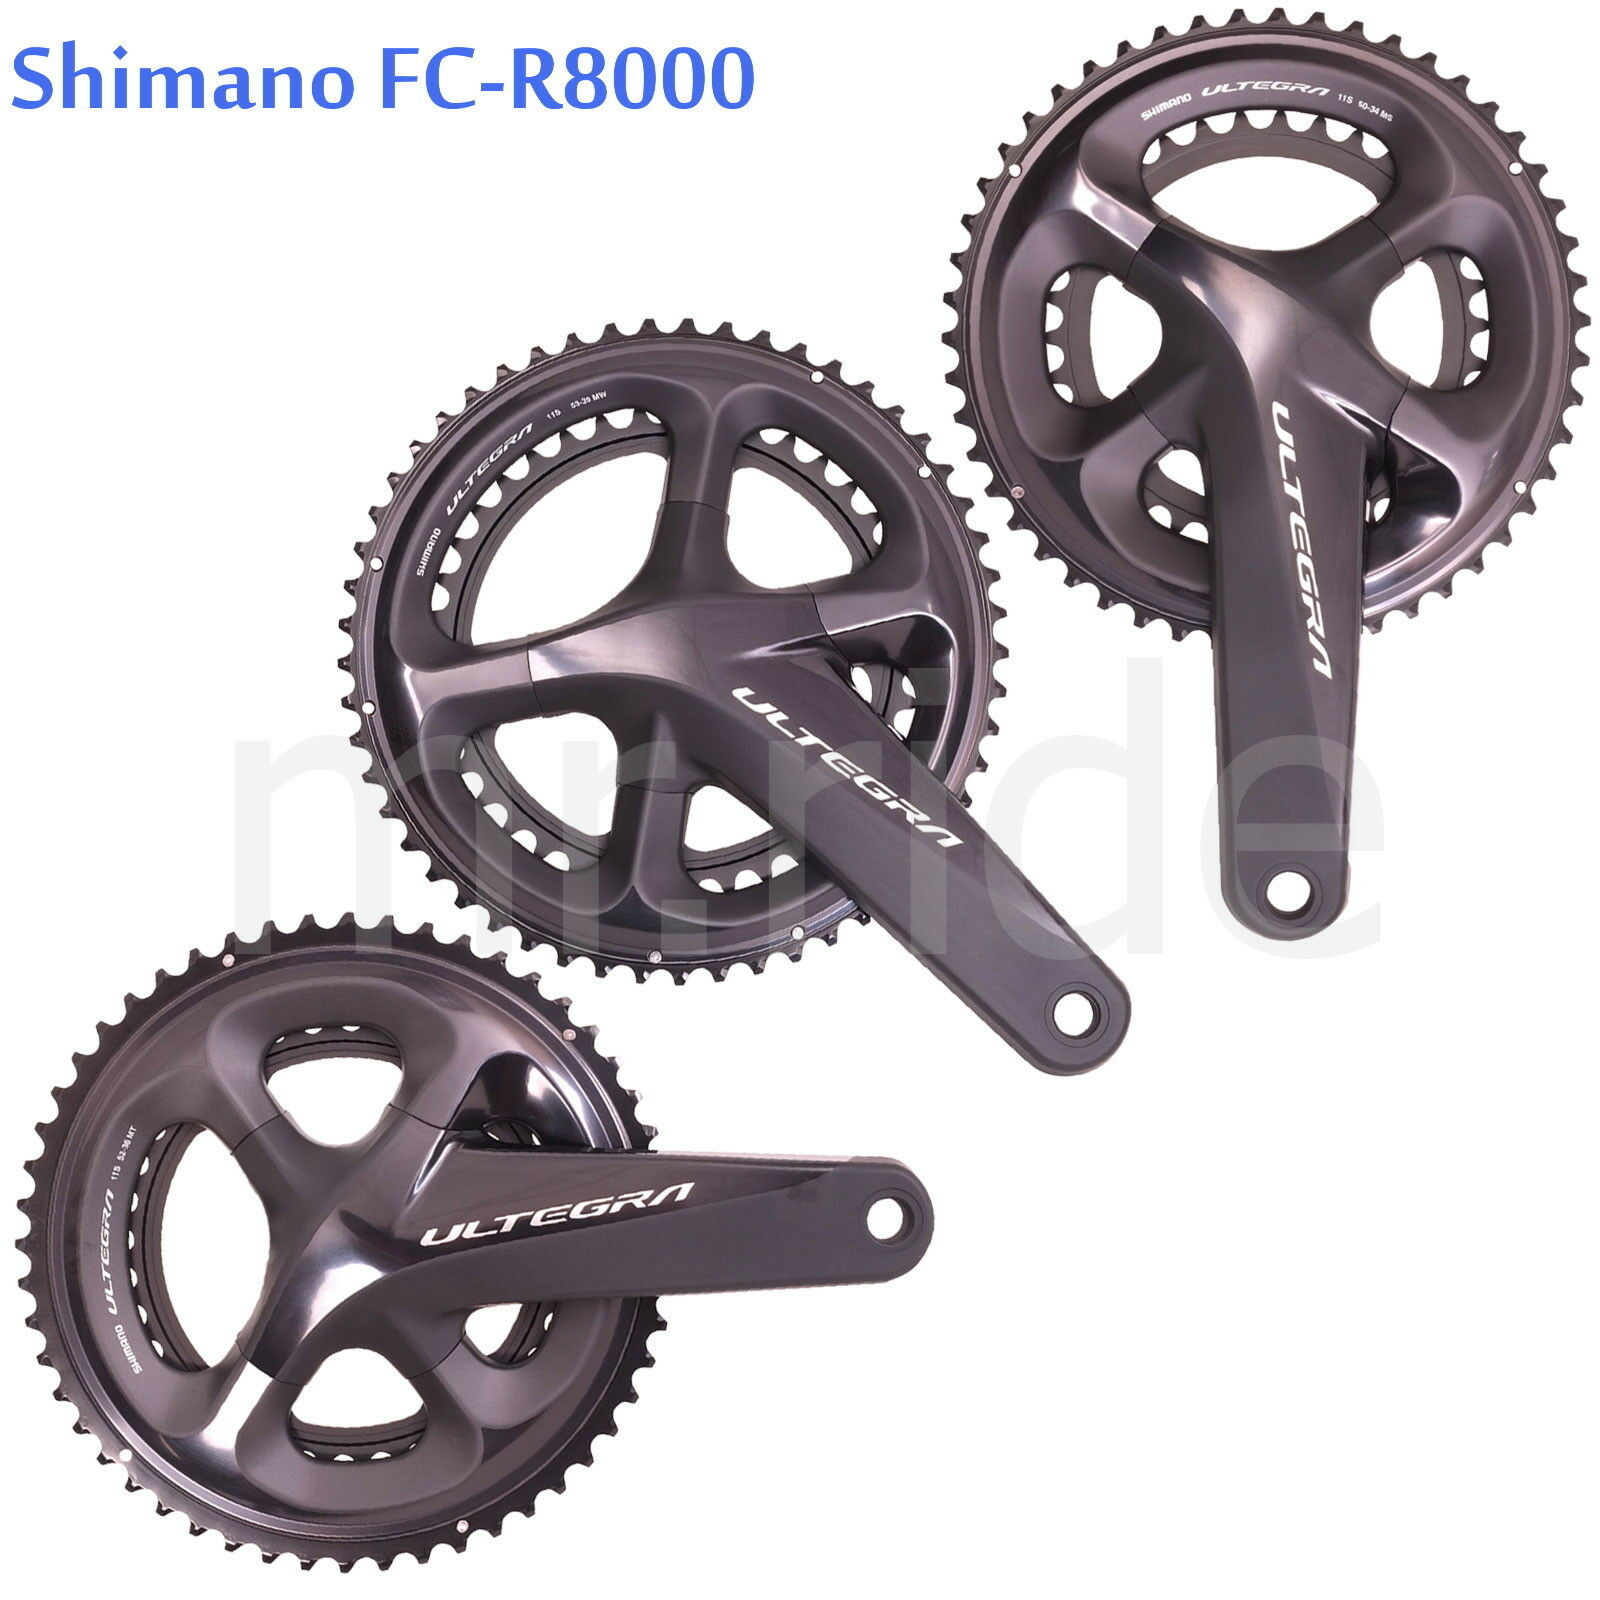 Shiuomoo Ultegra FCR8000 strada bicicletta Guarnitura 2x11S 165170172.5175mm,505253T